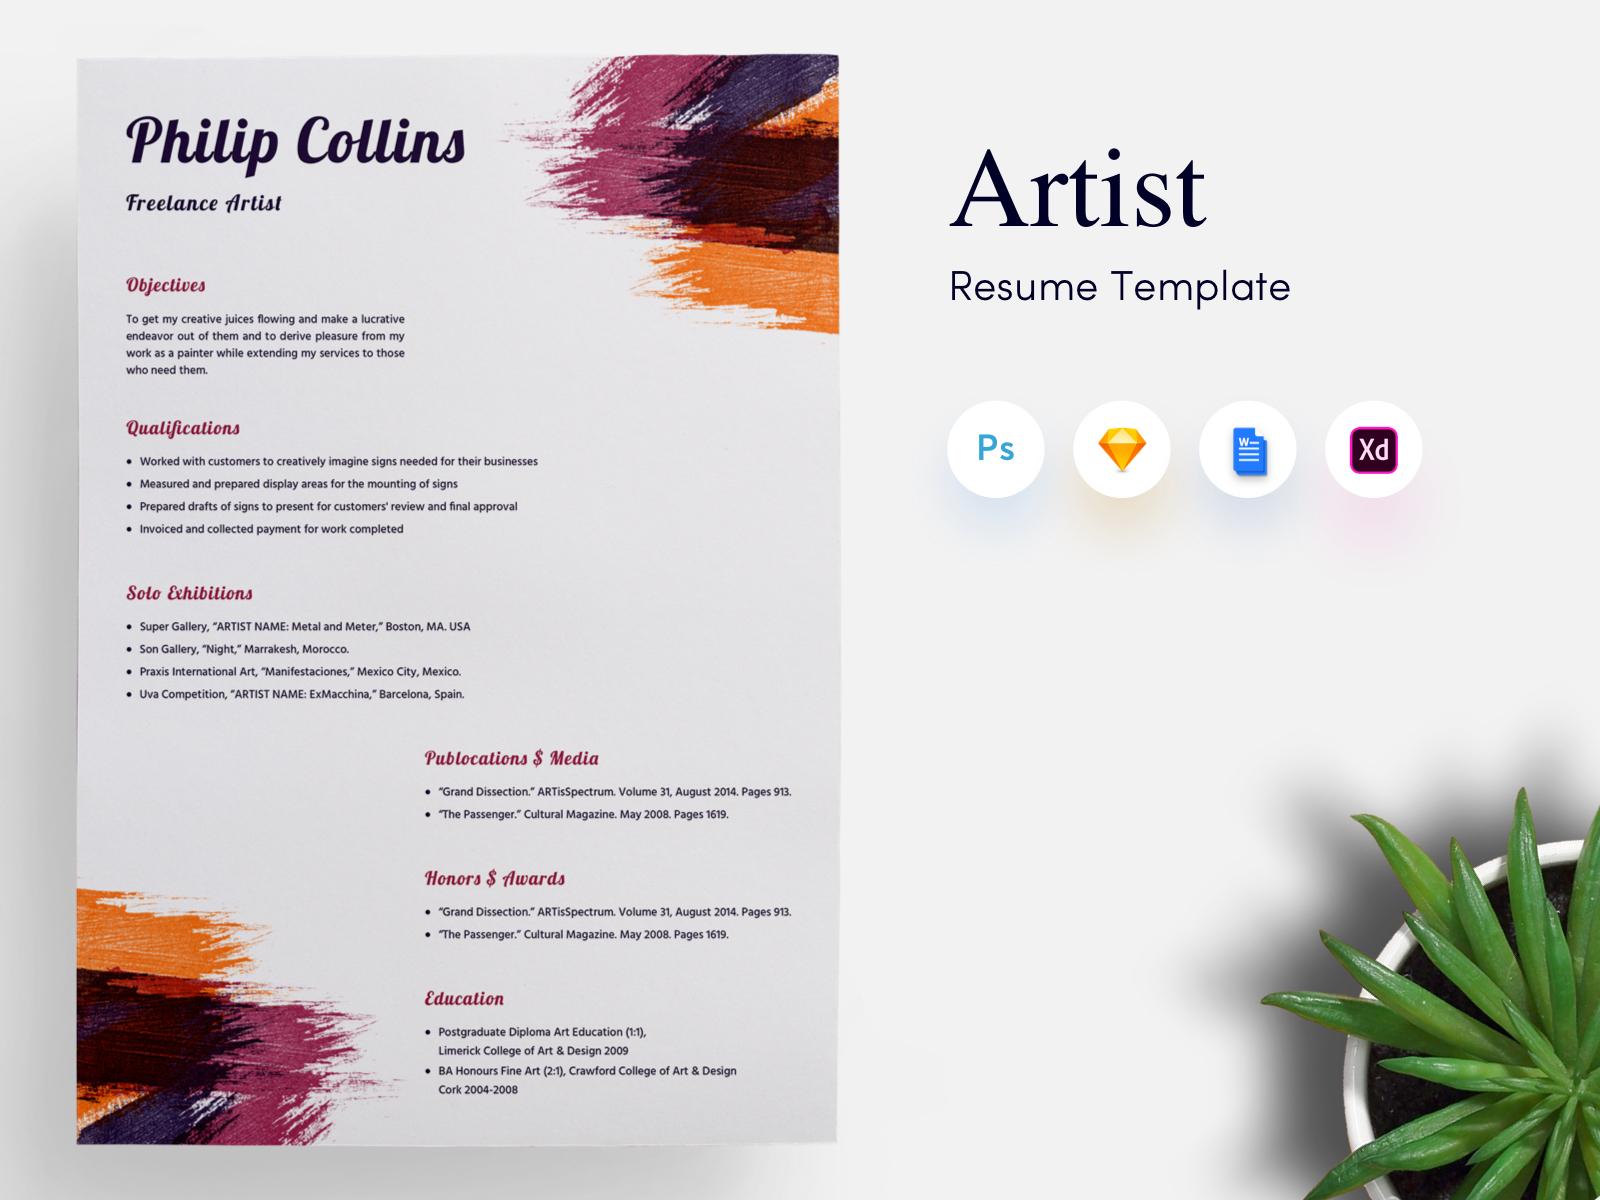 Freelance Artist Cv Resume Template By Getresume Co On Dribbble